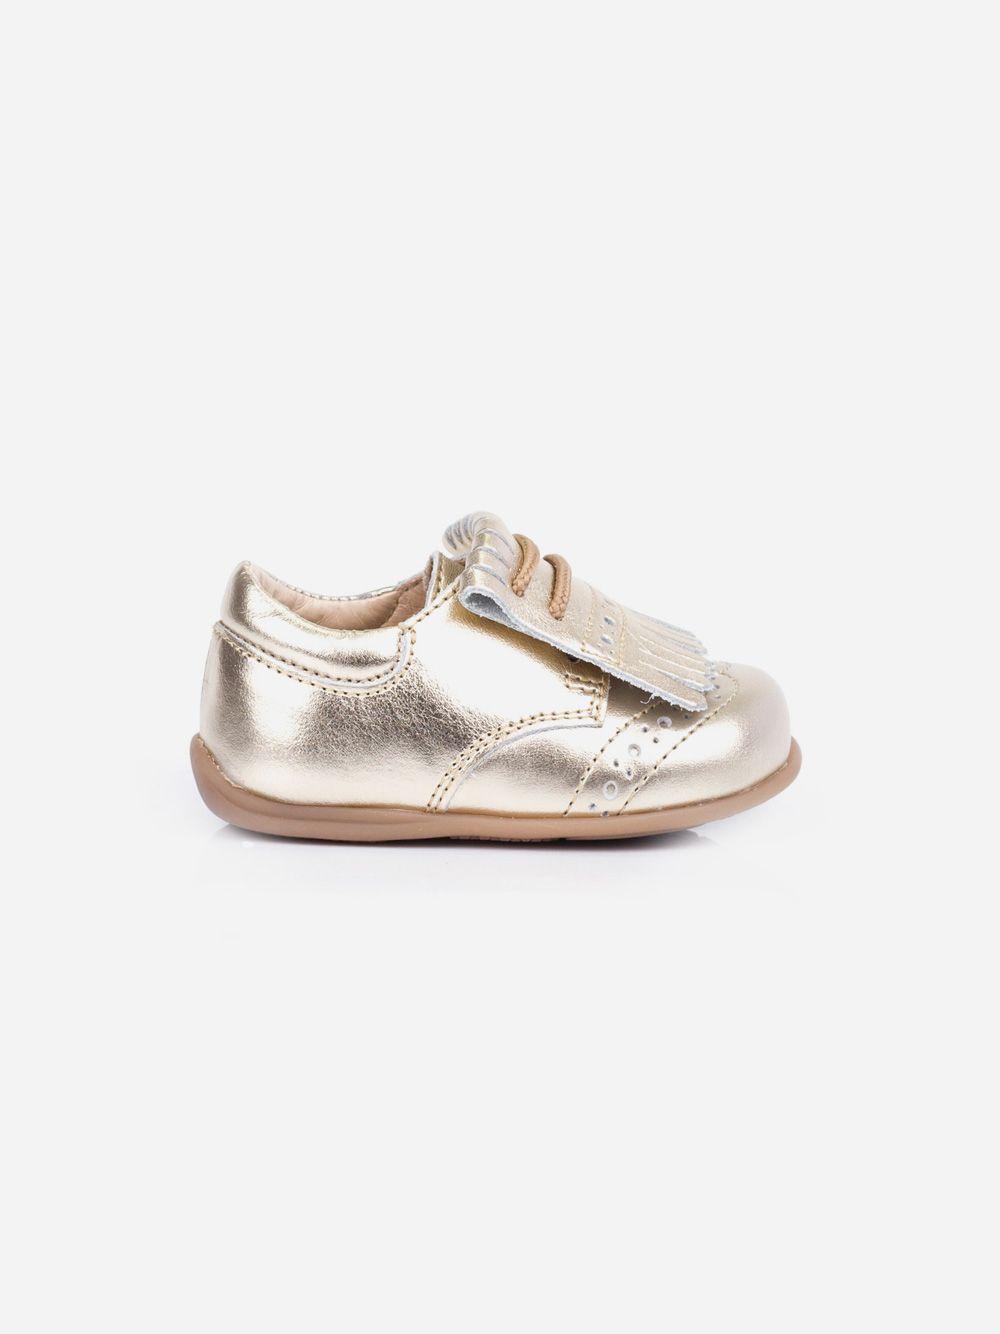 Sapatos Dourados L. Manuel | Pikitri